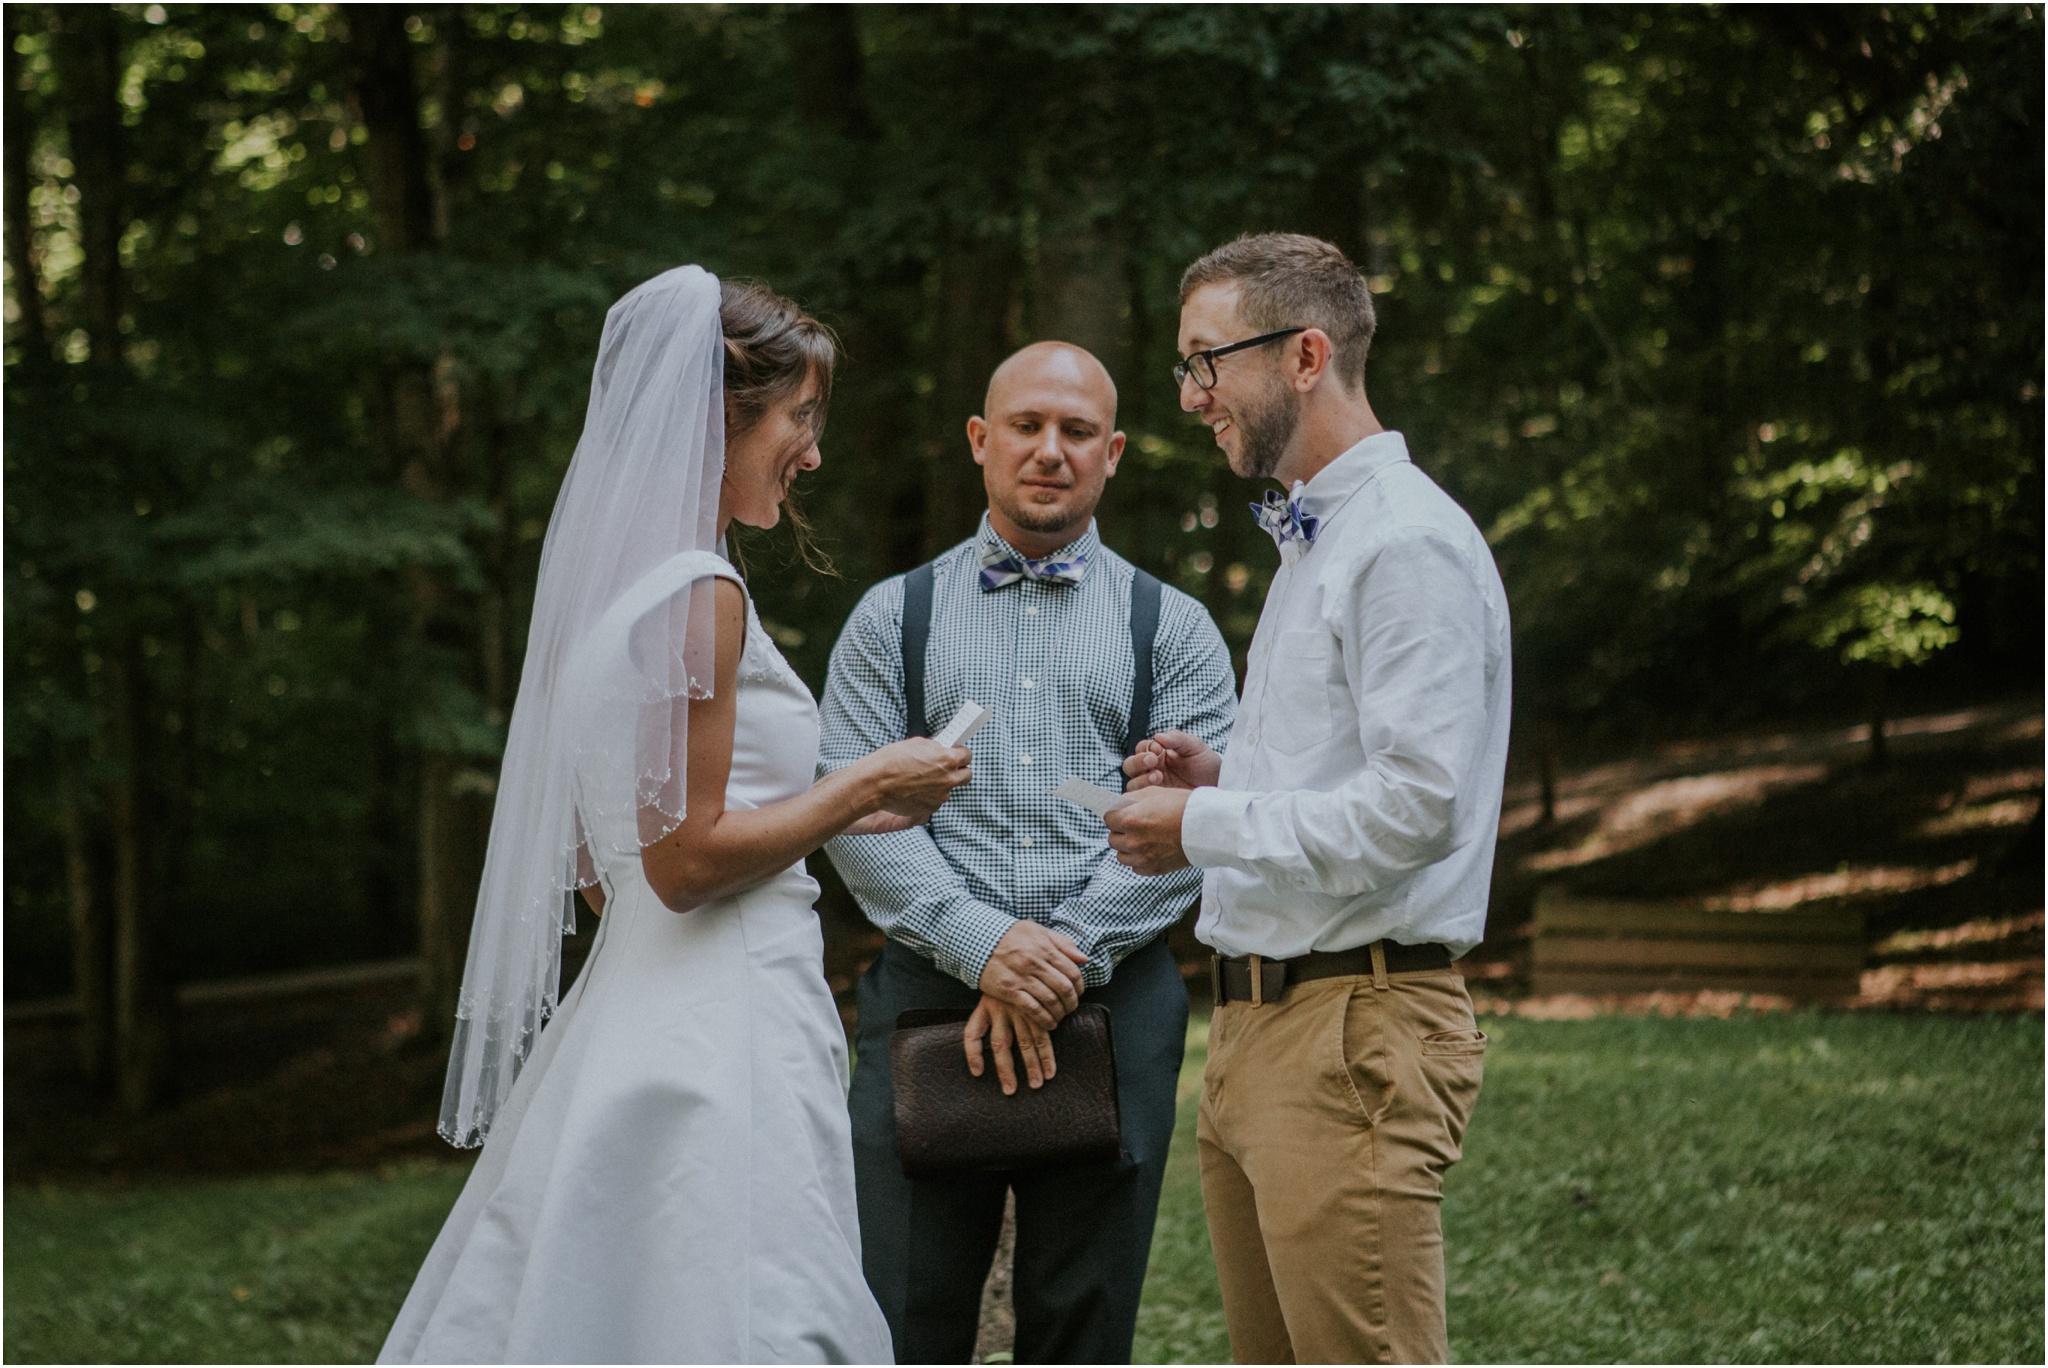 sugar-hollow-park-bristol-virginia-wedding-intimate-woodsy-black-forest-ceremony-adventurous-couple_0026.jpg